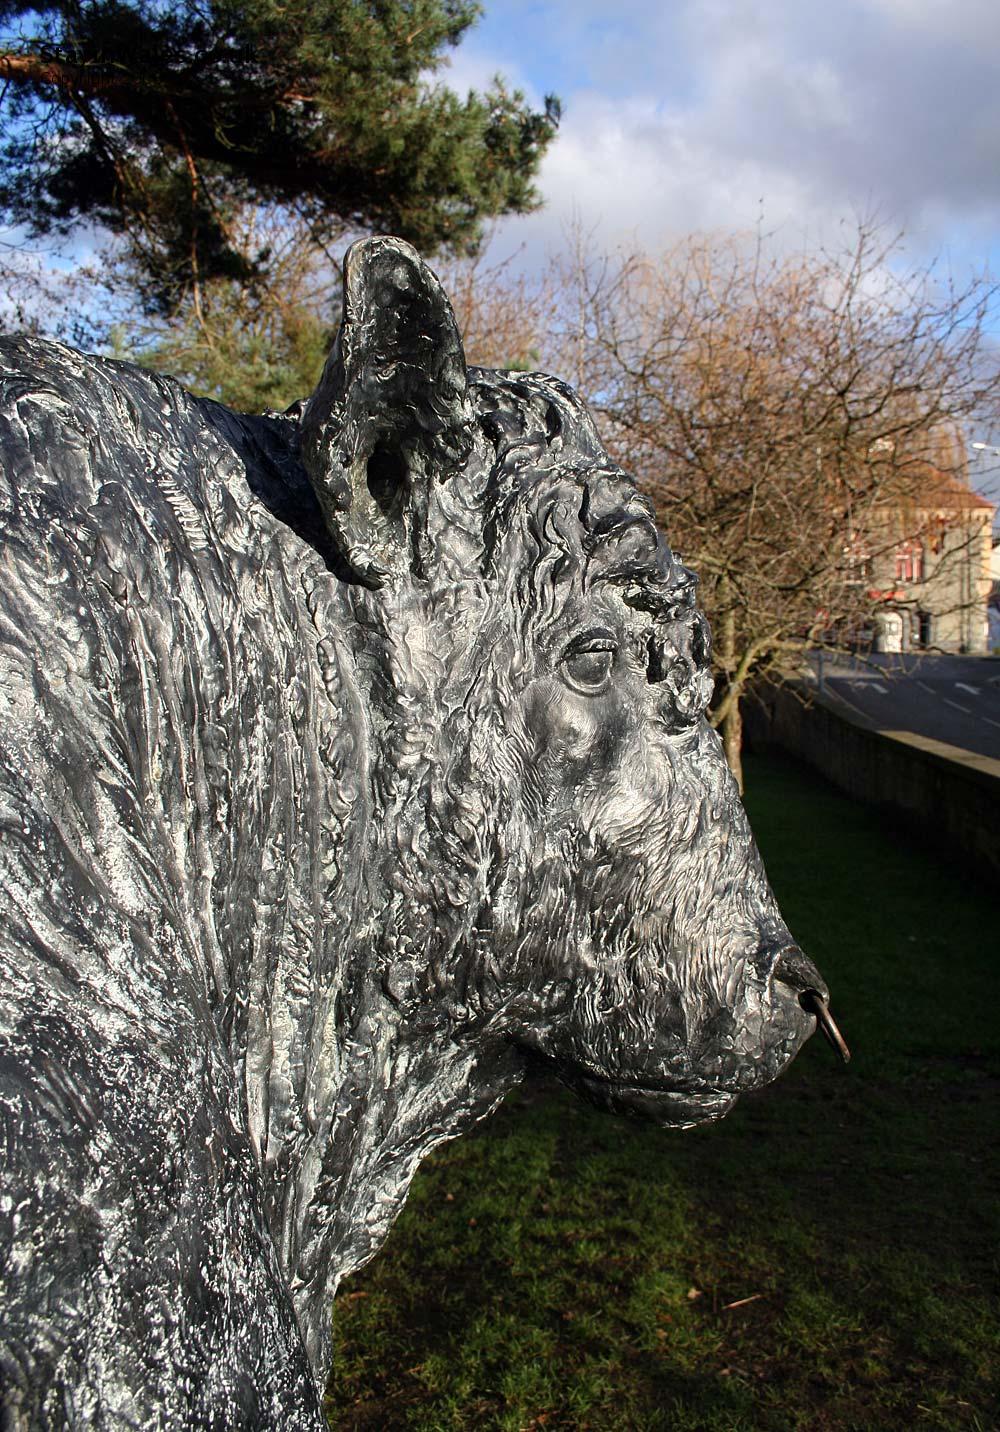 Builth Wells bull